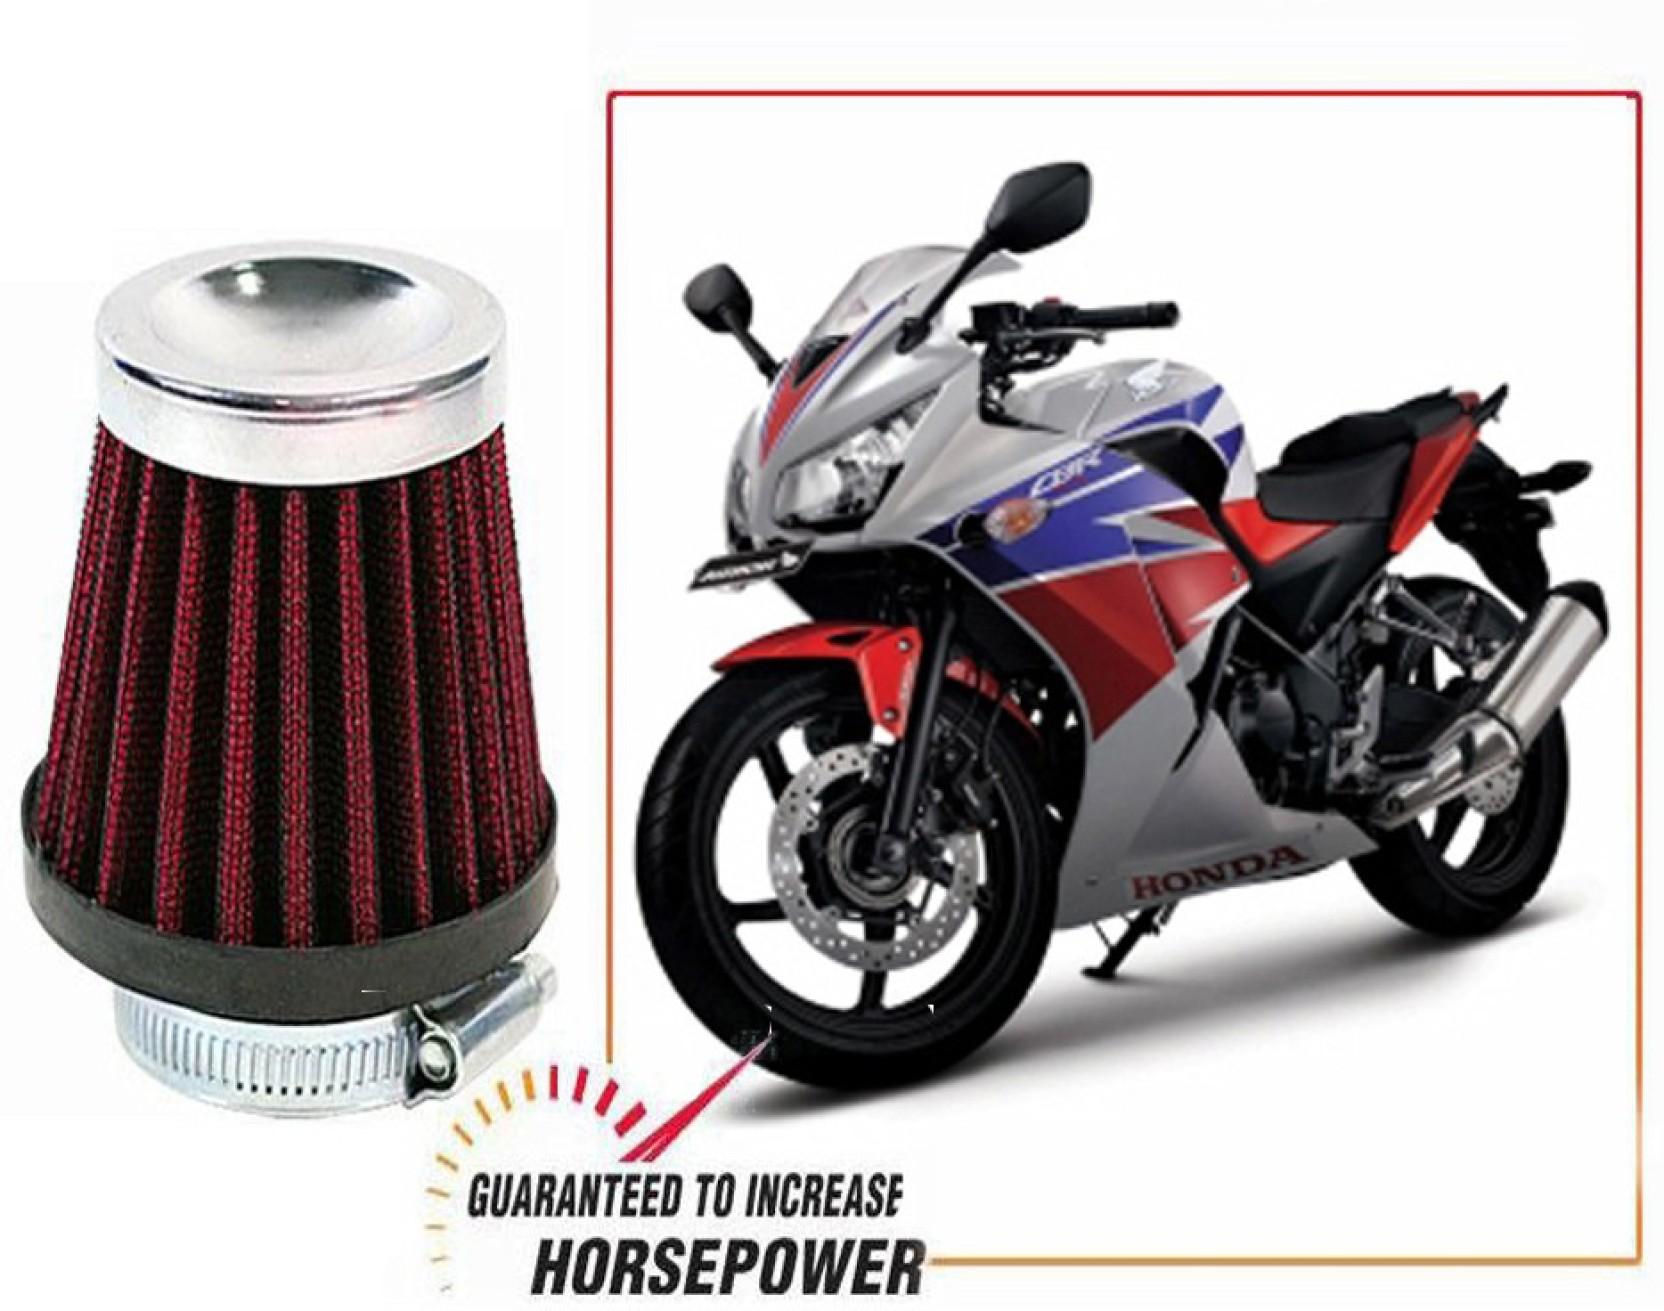 Hp Bike Air Filter For Honda Cbr 250r Price In India Buy Headlight T Shirt Add To Cart